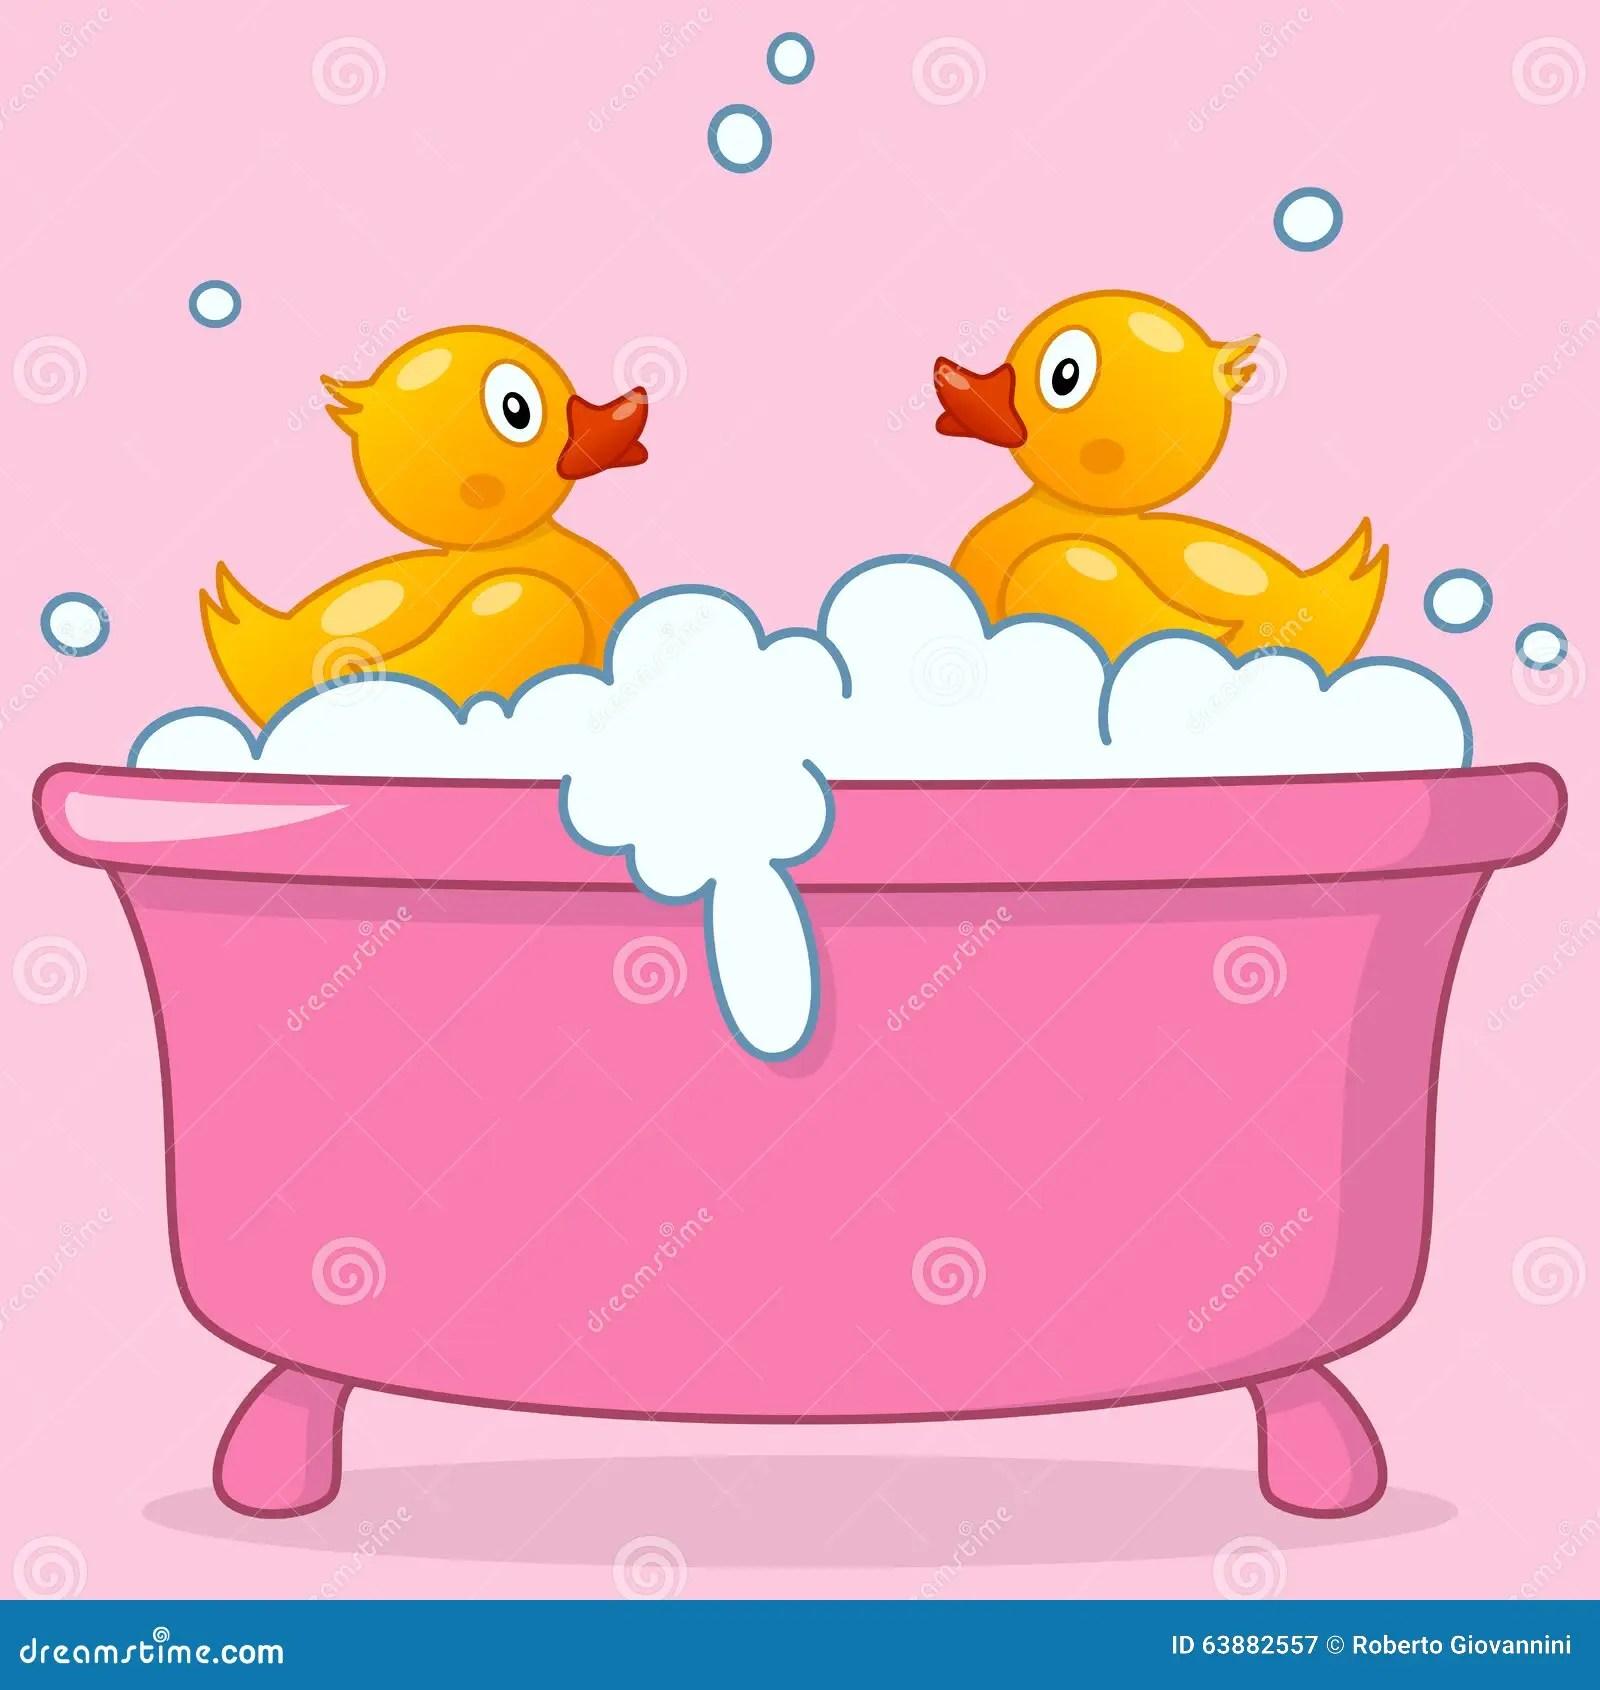 Cartoon Girl Bathtub With Rubber Ducks Stock Vector